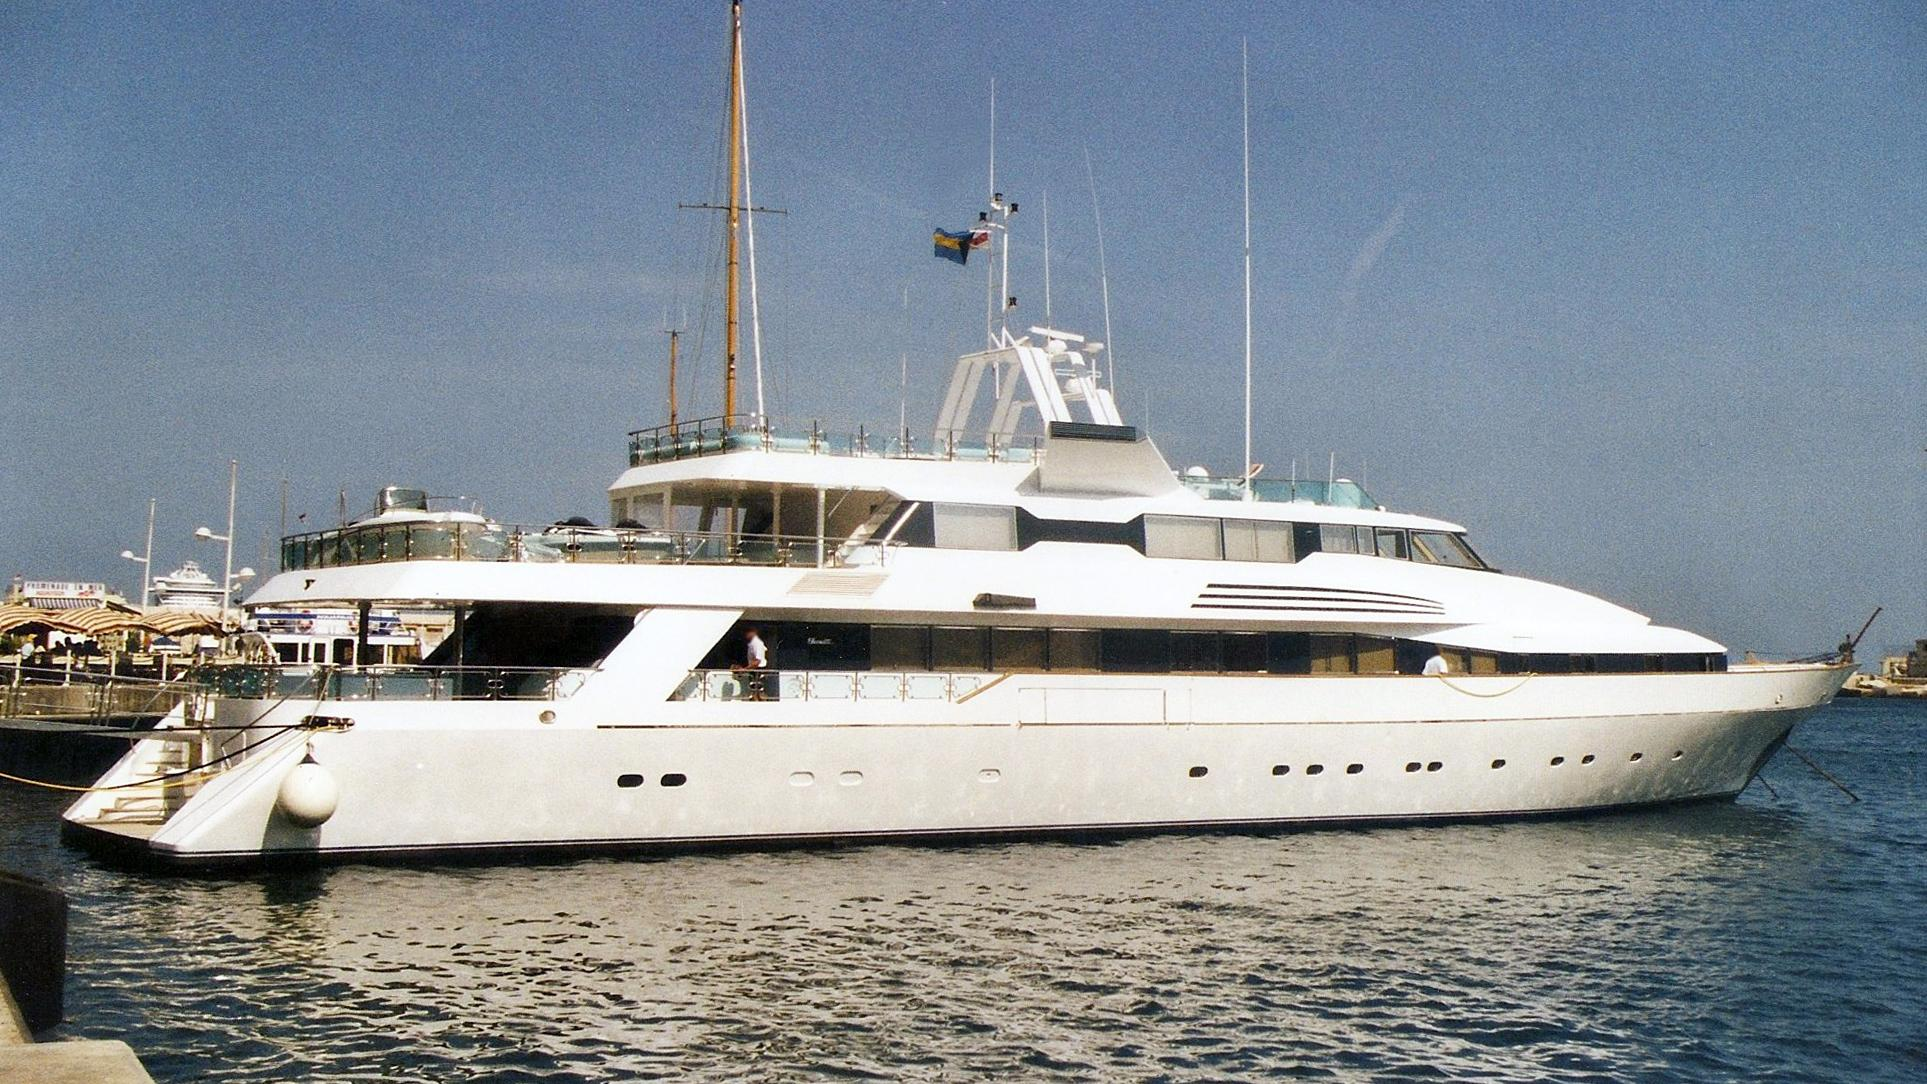 rima-ii-motor-yacht-benetti-45m-1987-49m-before-refit